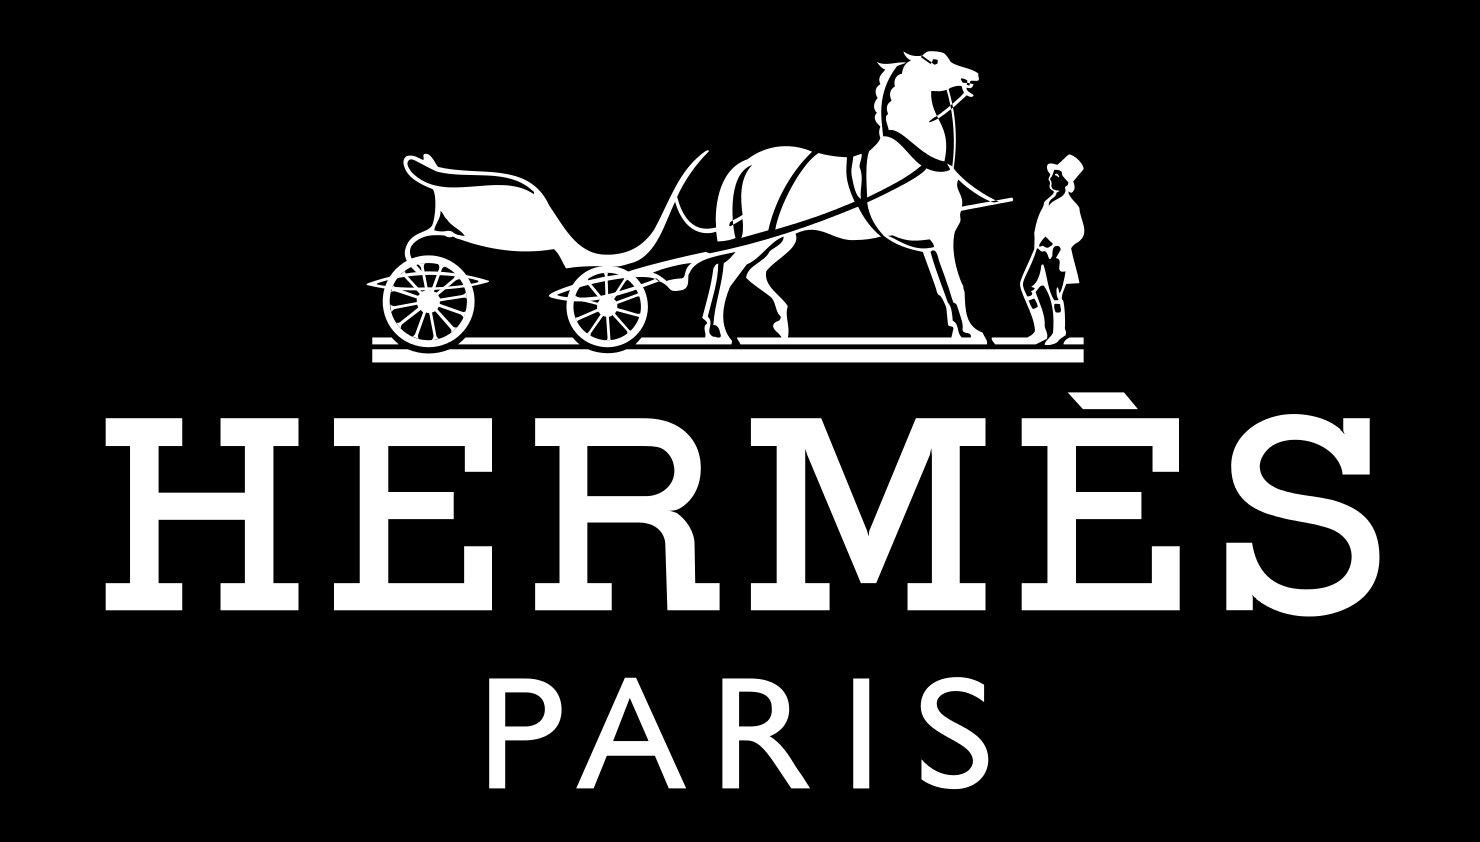 Hermes Logo, Hermes Symbol Meaning, History and Evolution